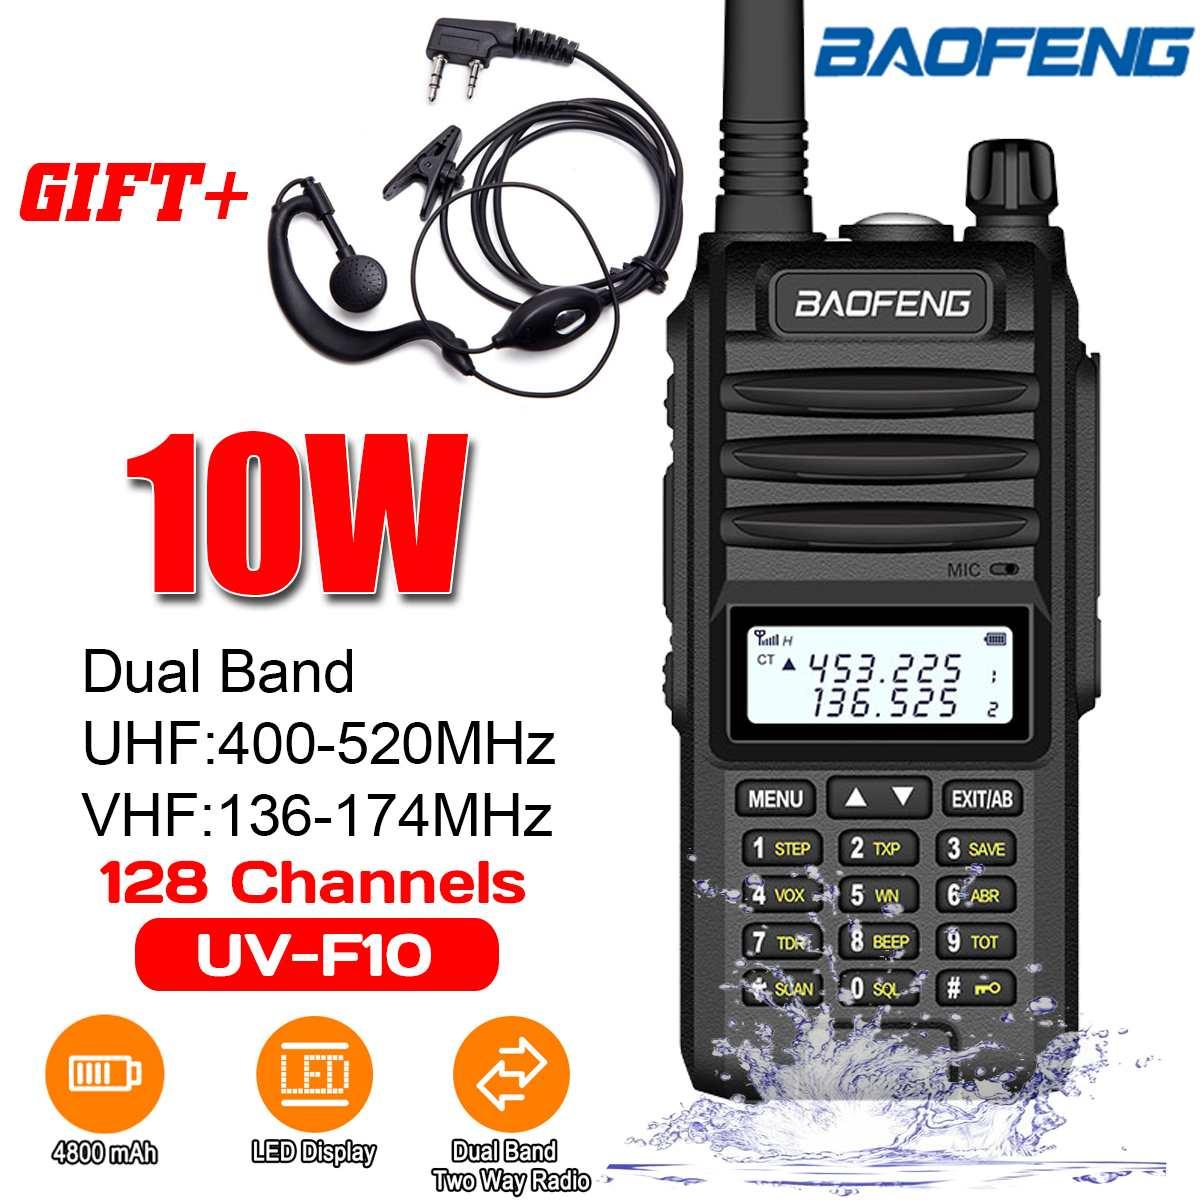 Baofeng BF-UVF10 Walkie Talkie VHF UHF 10W Waterproof Walkie Talki Dual Band Handheld Two Way Radio 520MHz 128 Channels Radio